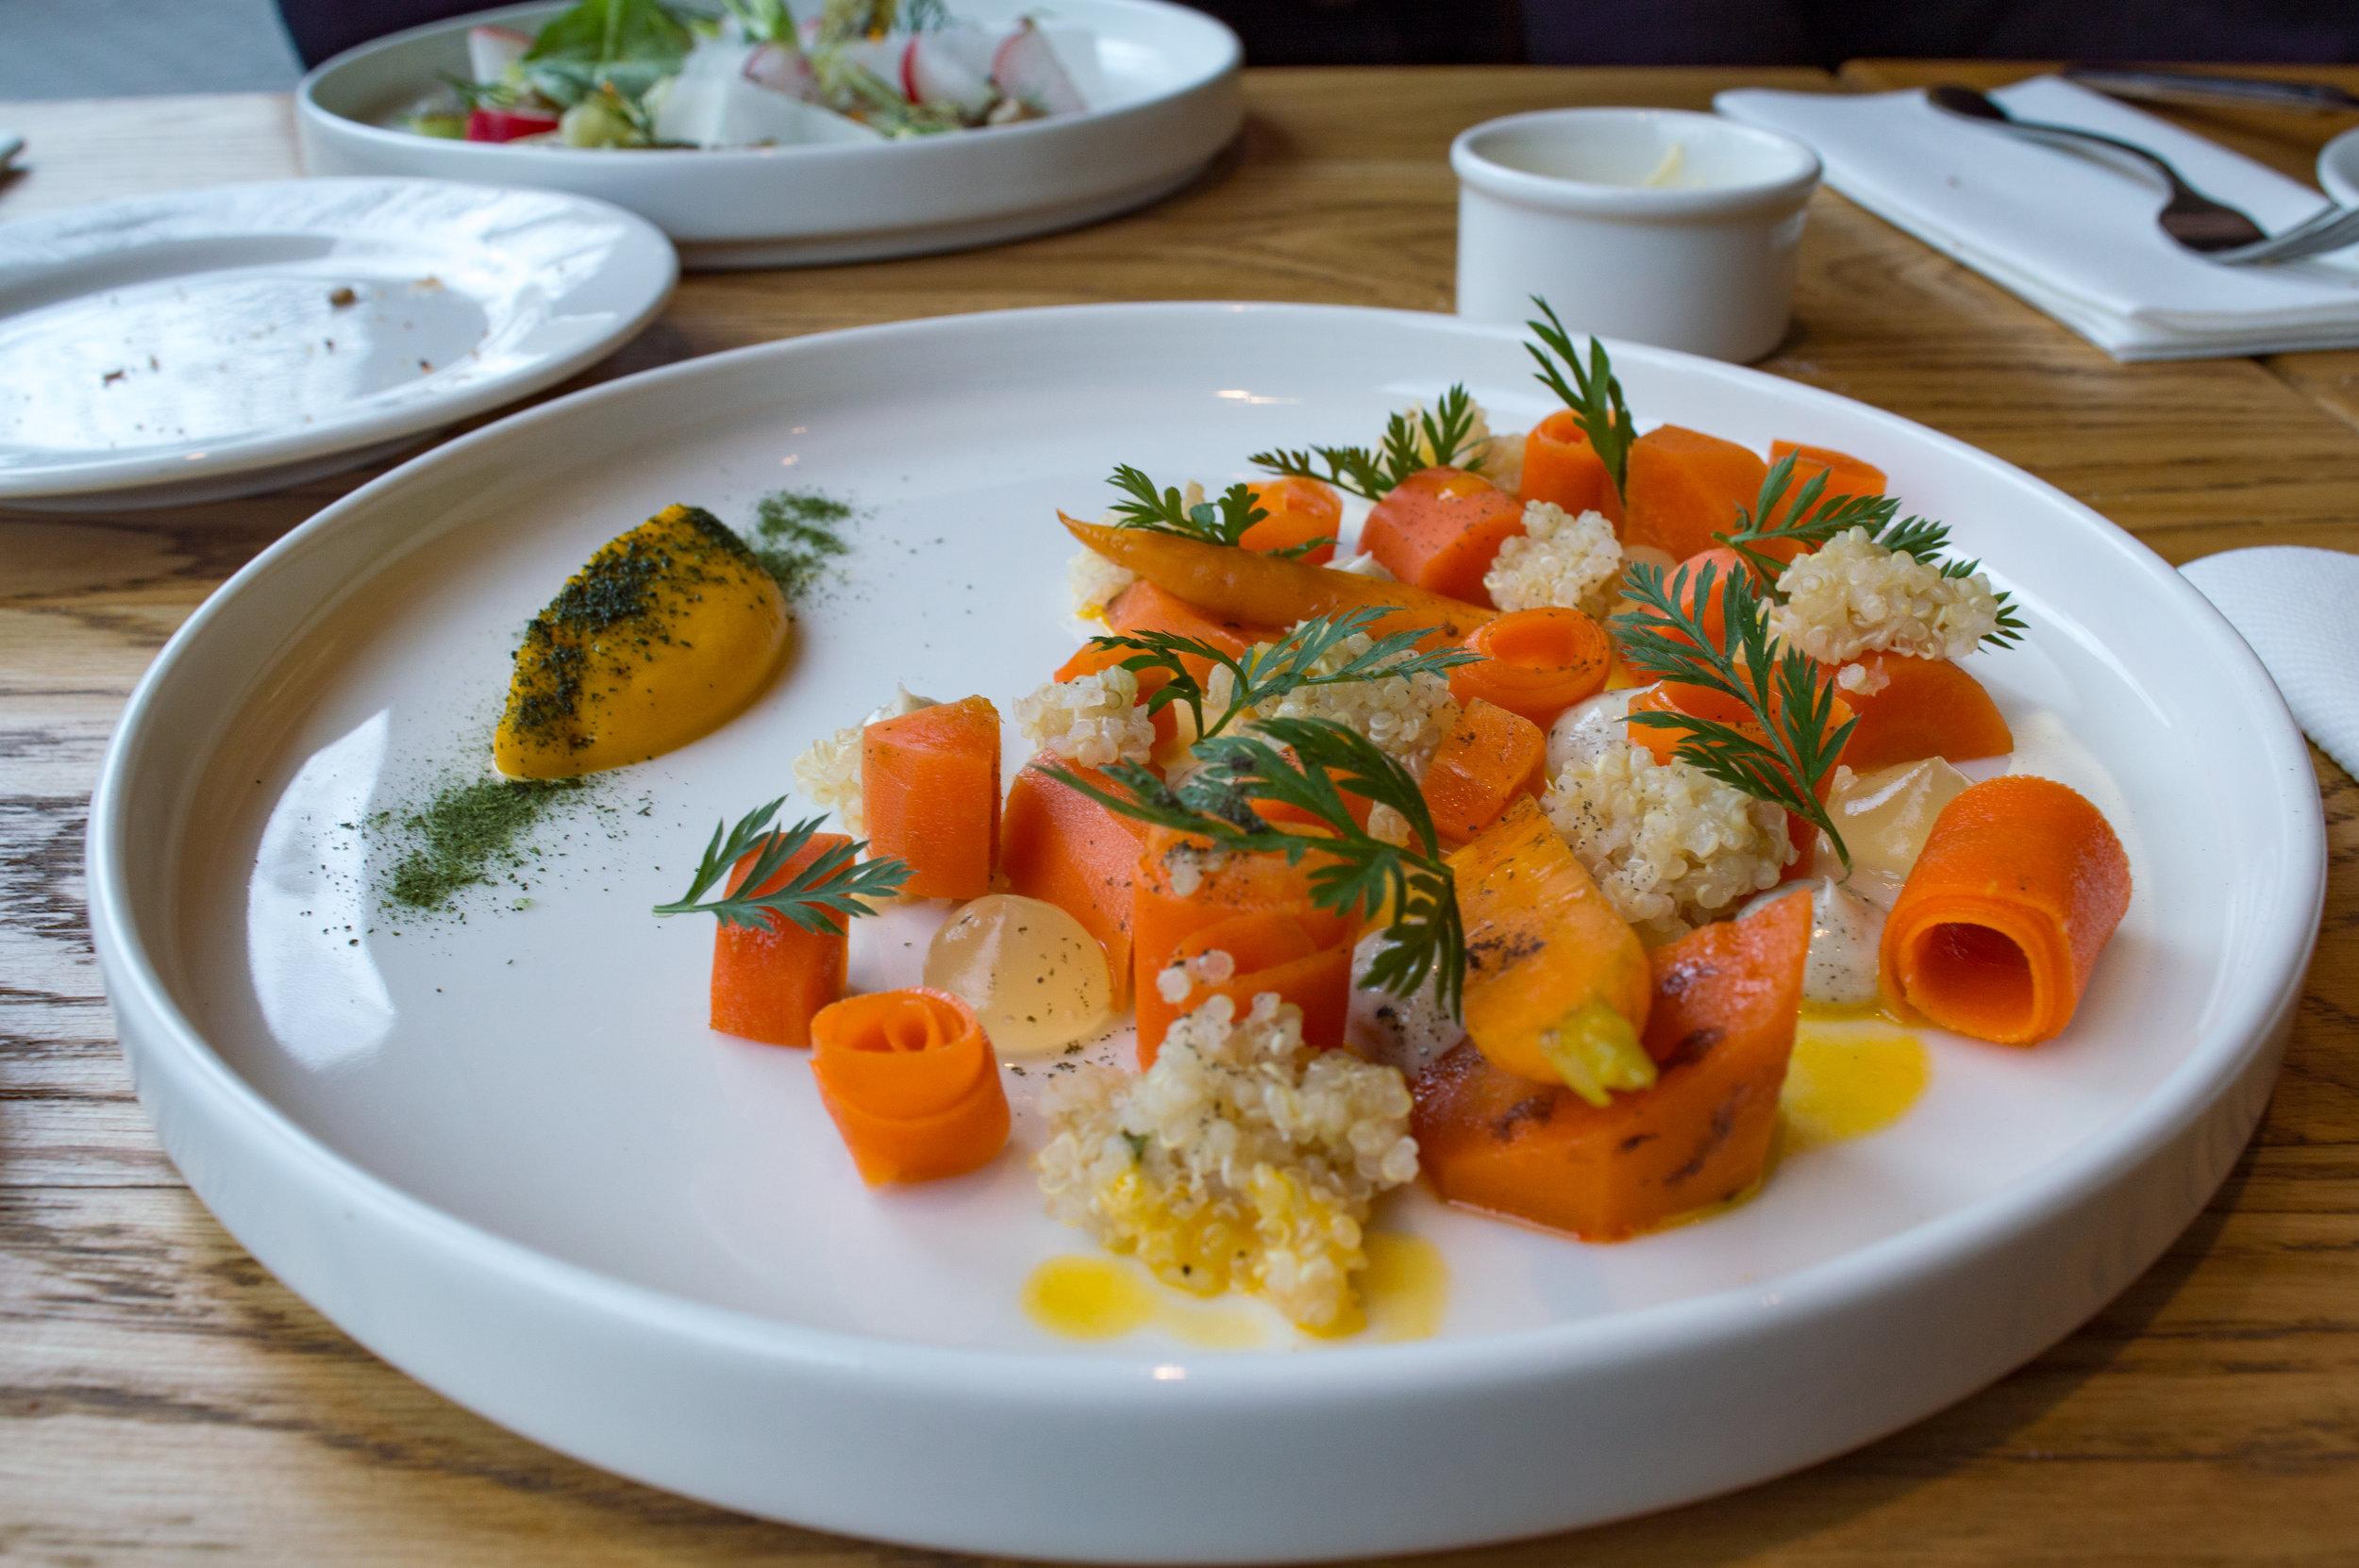 Vegetarian option:quinoa / cider / carrot / nori at Rozbrat 20